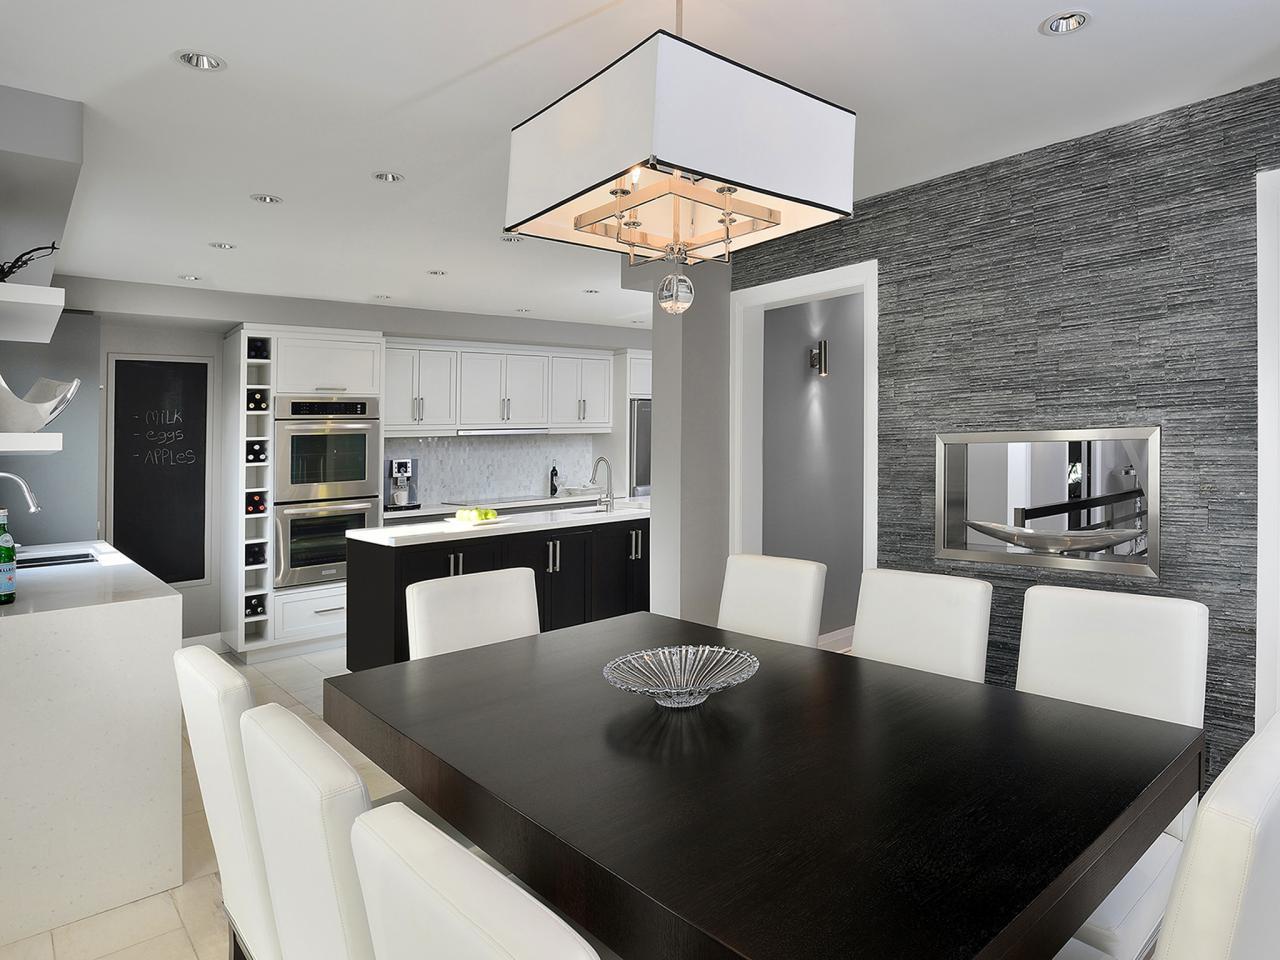 UShaped Kitchen Design Ideas Pictures  Ideas From HGTV HGTV - U shaped kitchen layouts